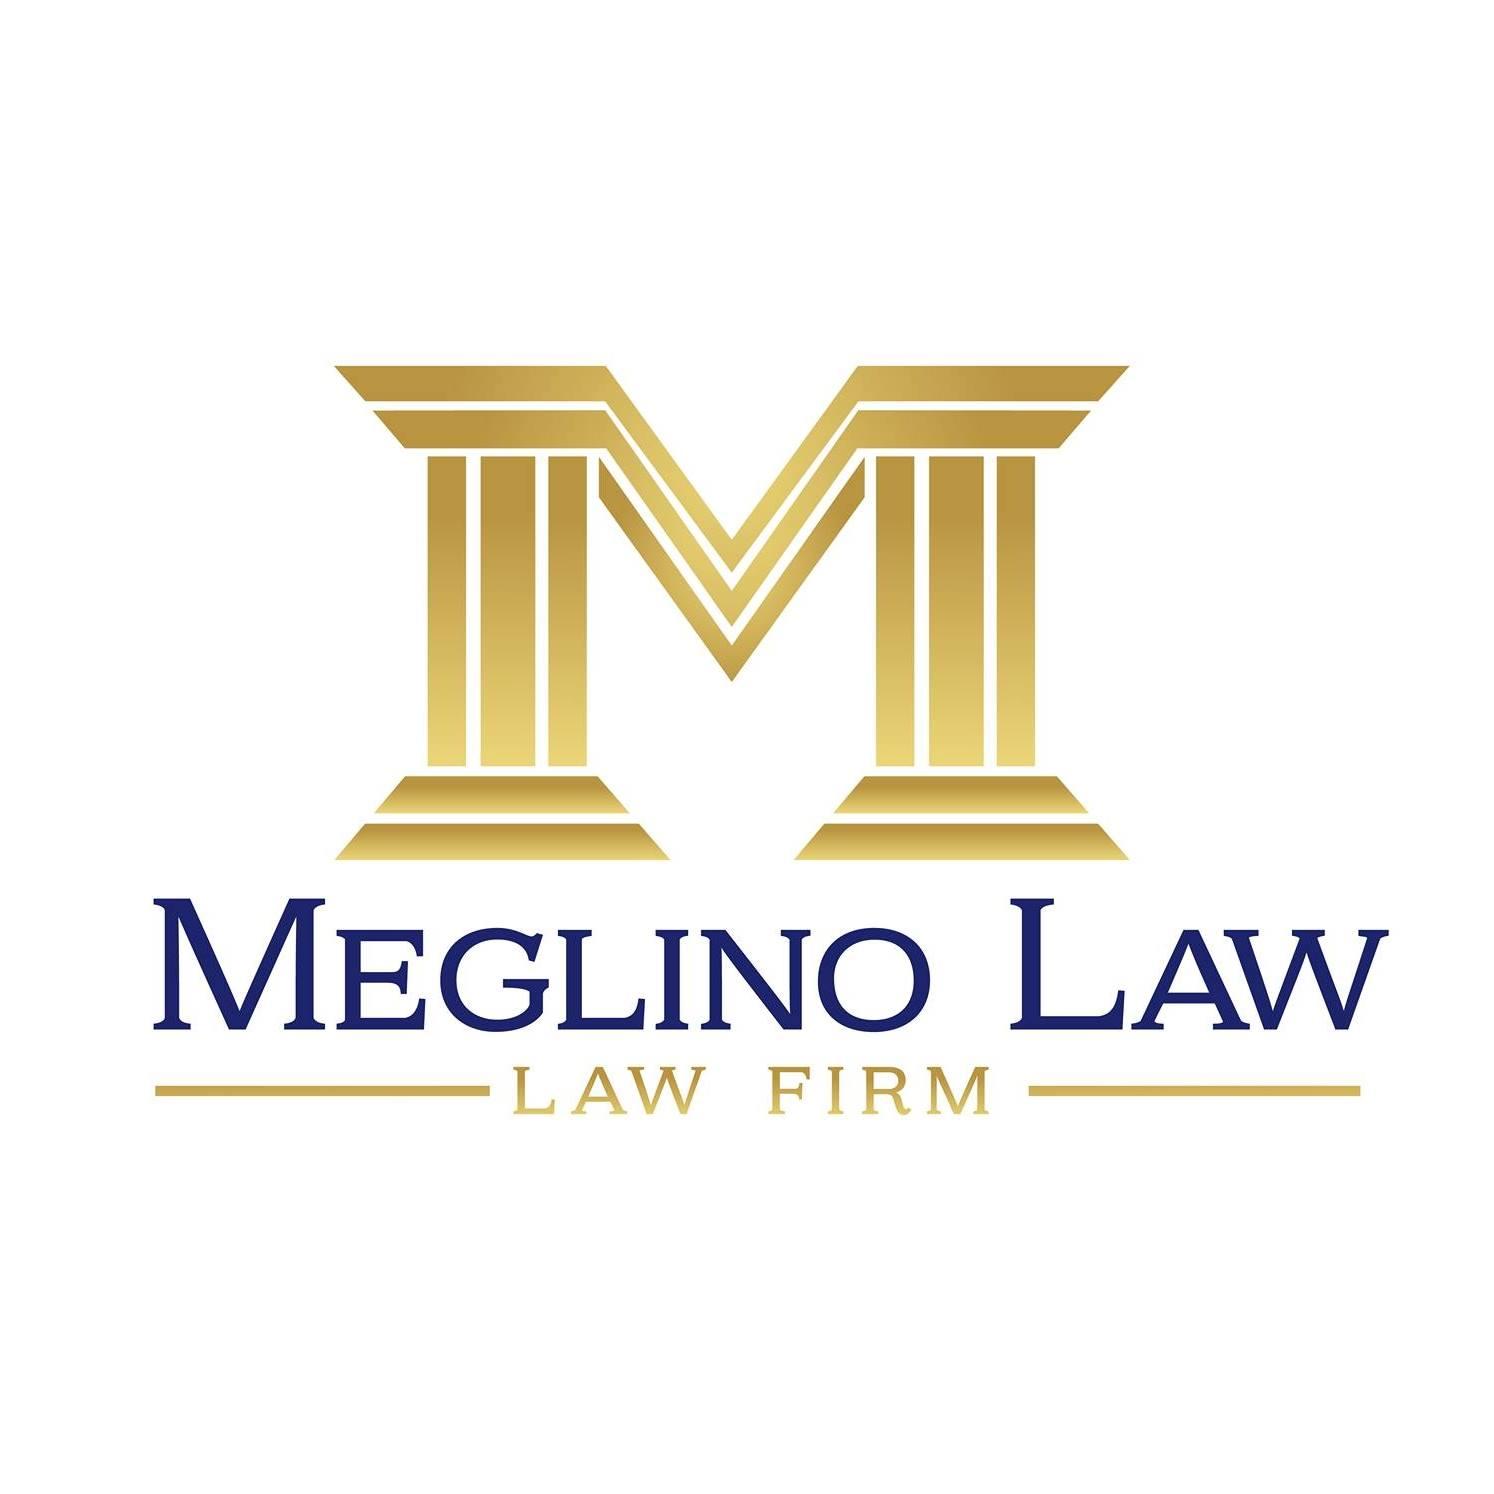 Meglino Law